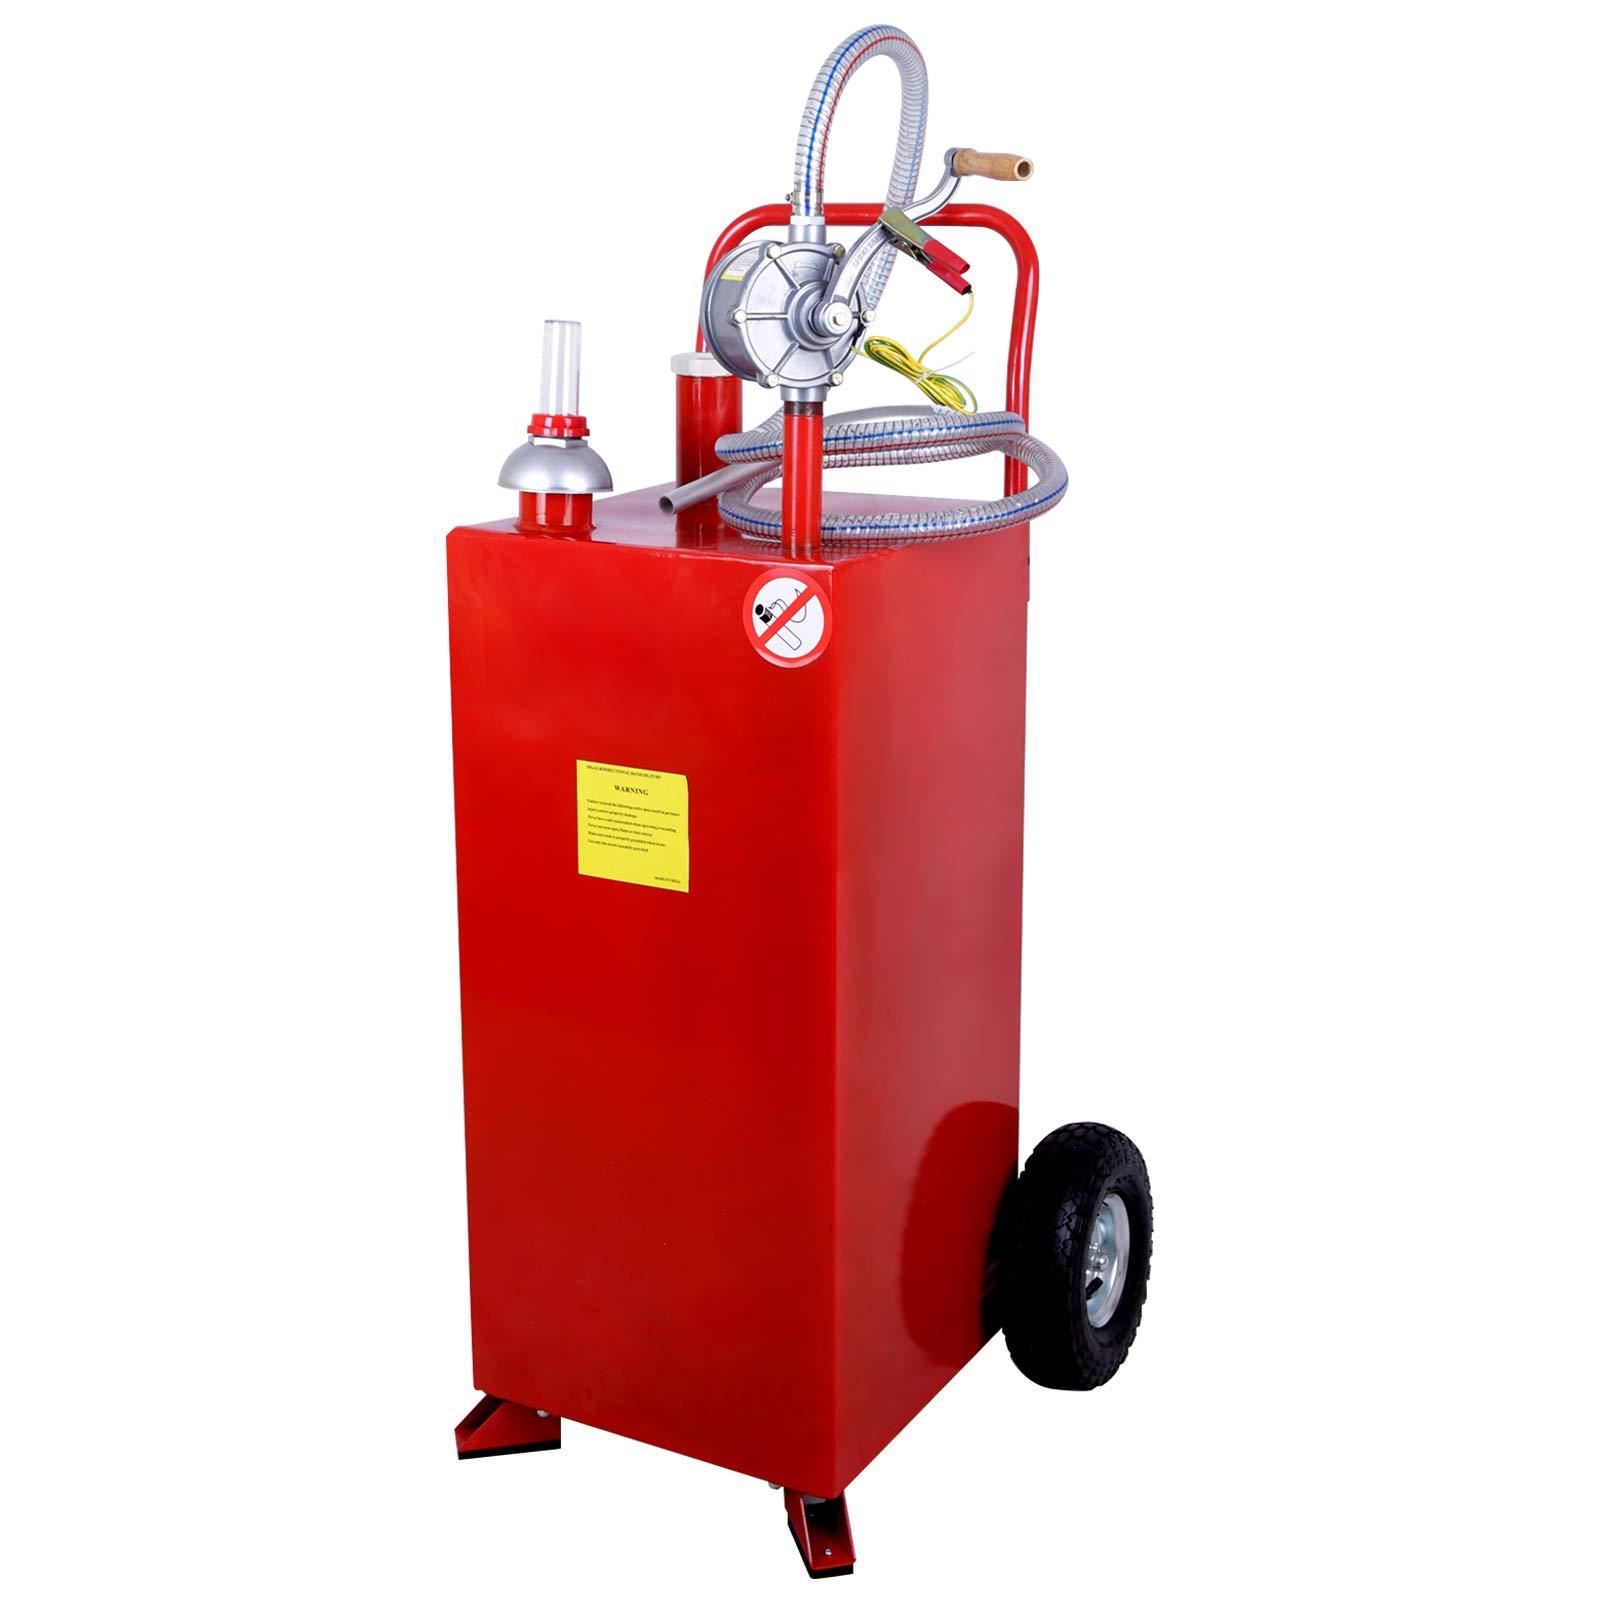 SUNCOO 30 Gallon Portable Gas Caddy Tank on Wheels Fuel Storage Gasoline Fluid Diesel with Pump &Hard Tube Red